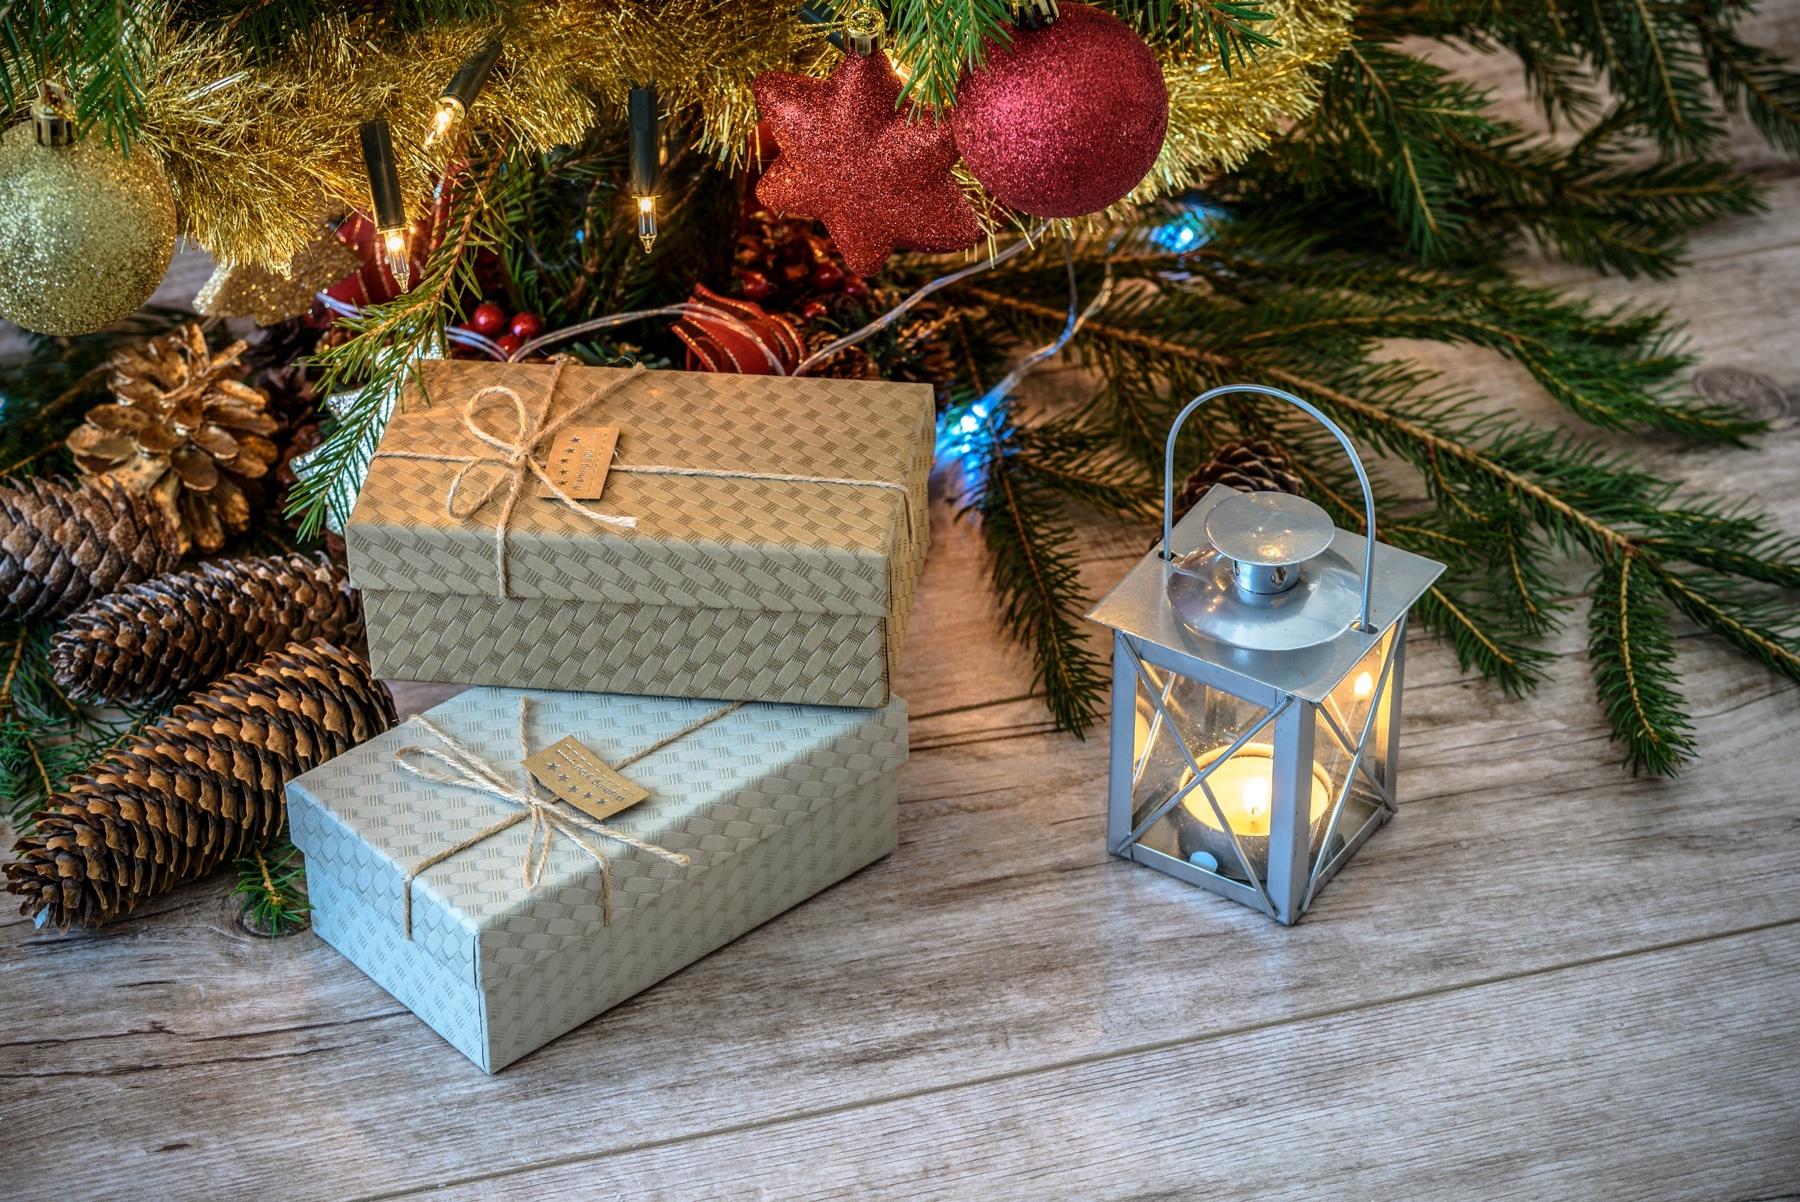 retro-gifts-1847088